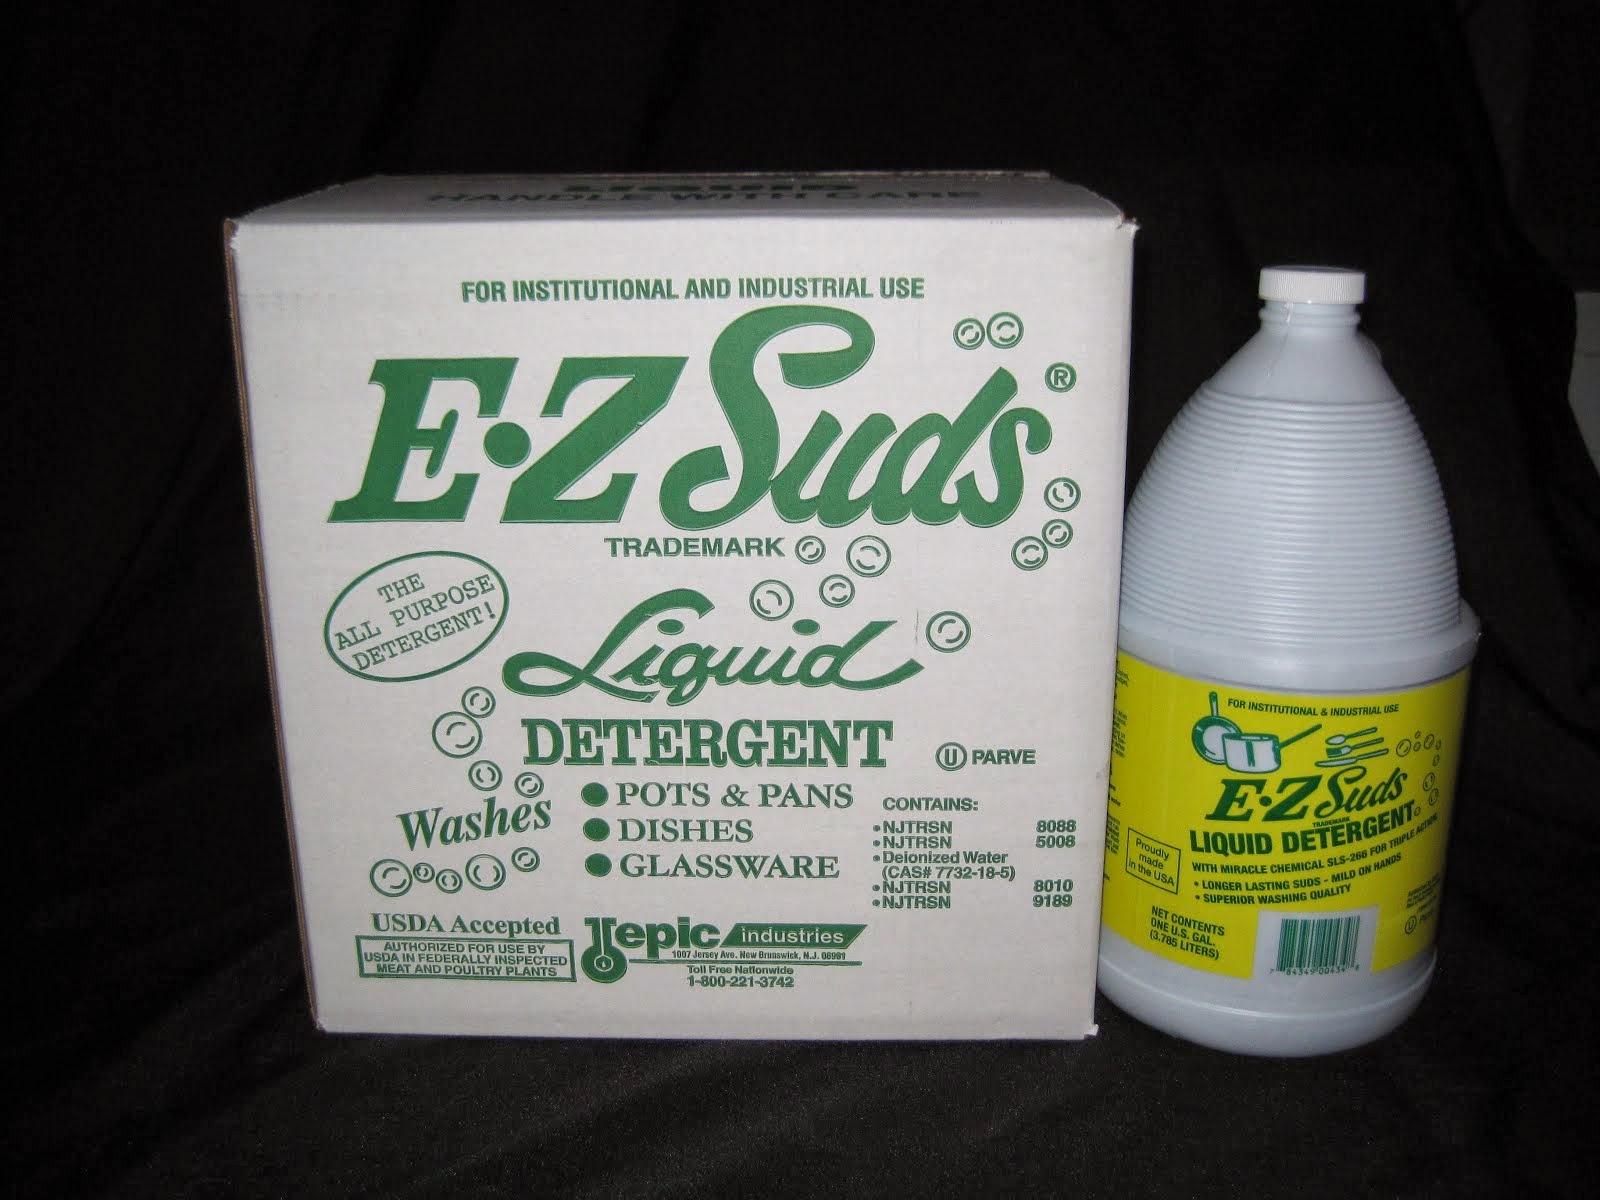 E-Z Suds Pot & pan Soap 4/1 gal - Item # 68250 & 68251 for the split